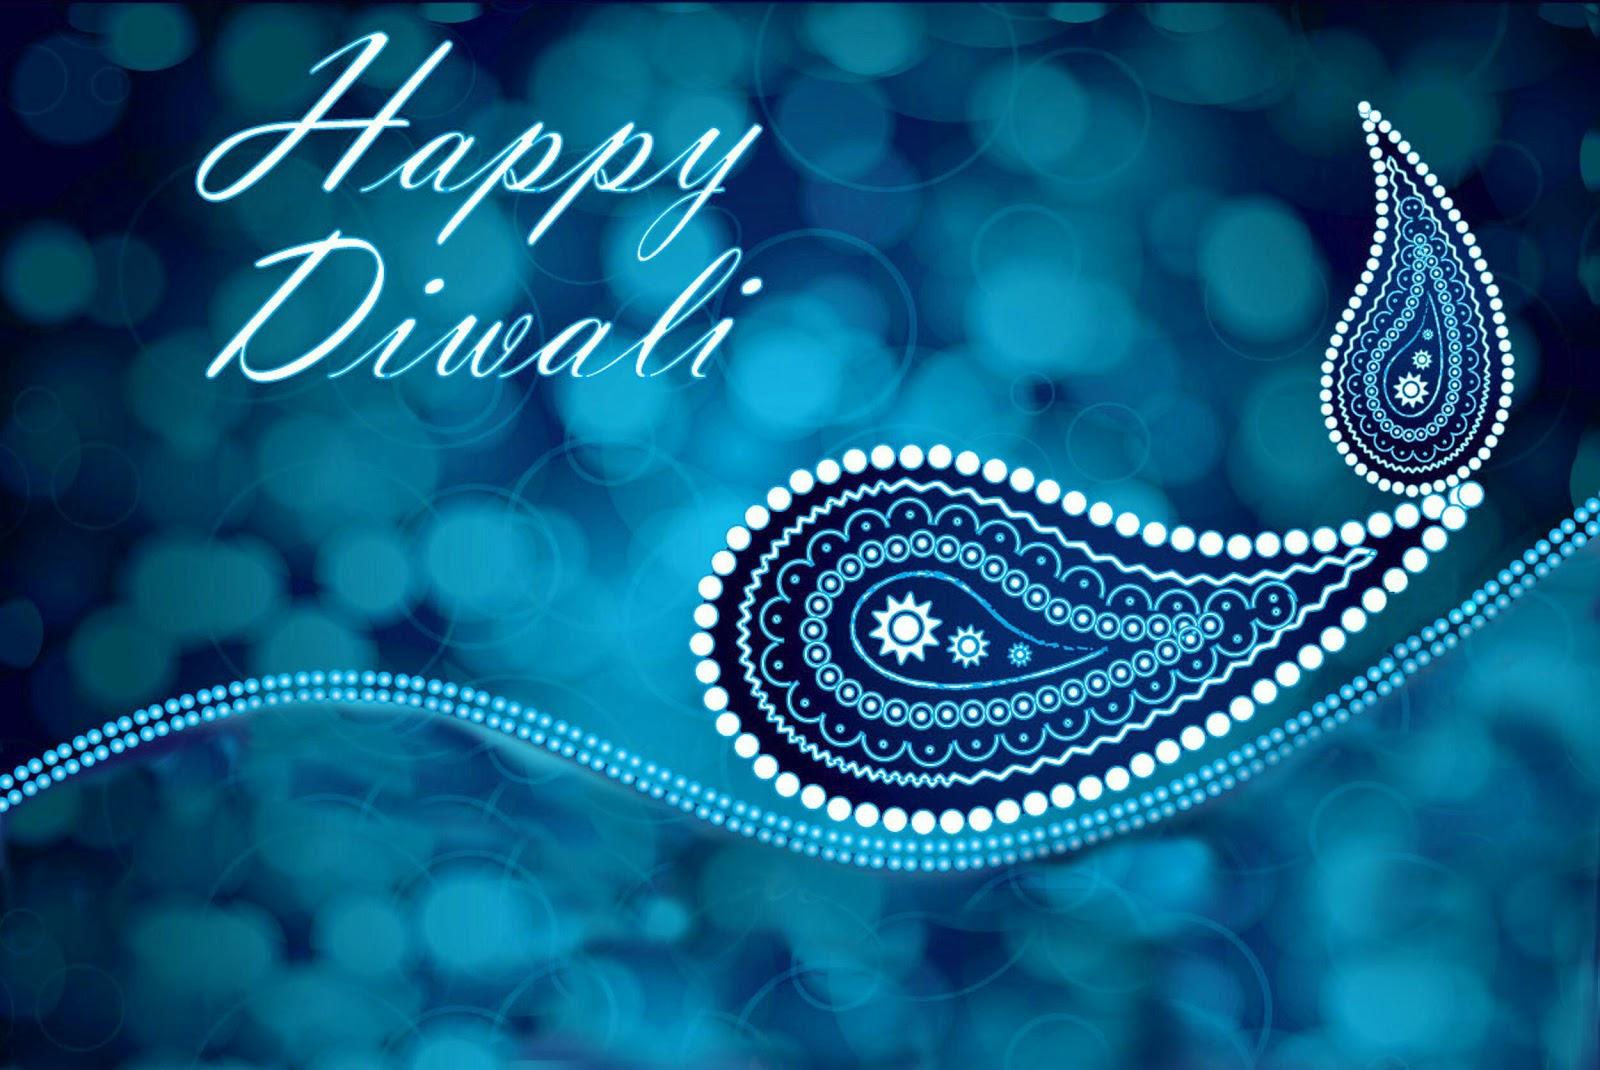 HD Images Of Happy Diwali 2017